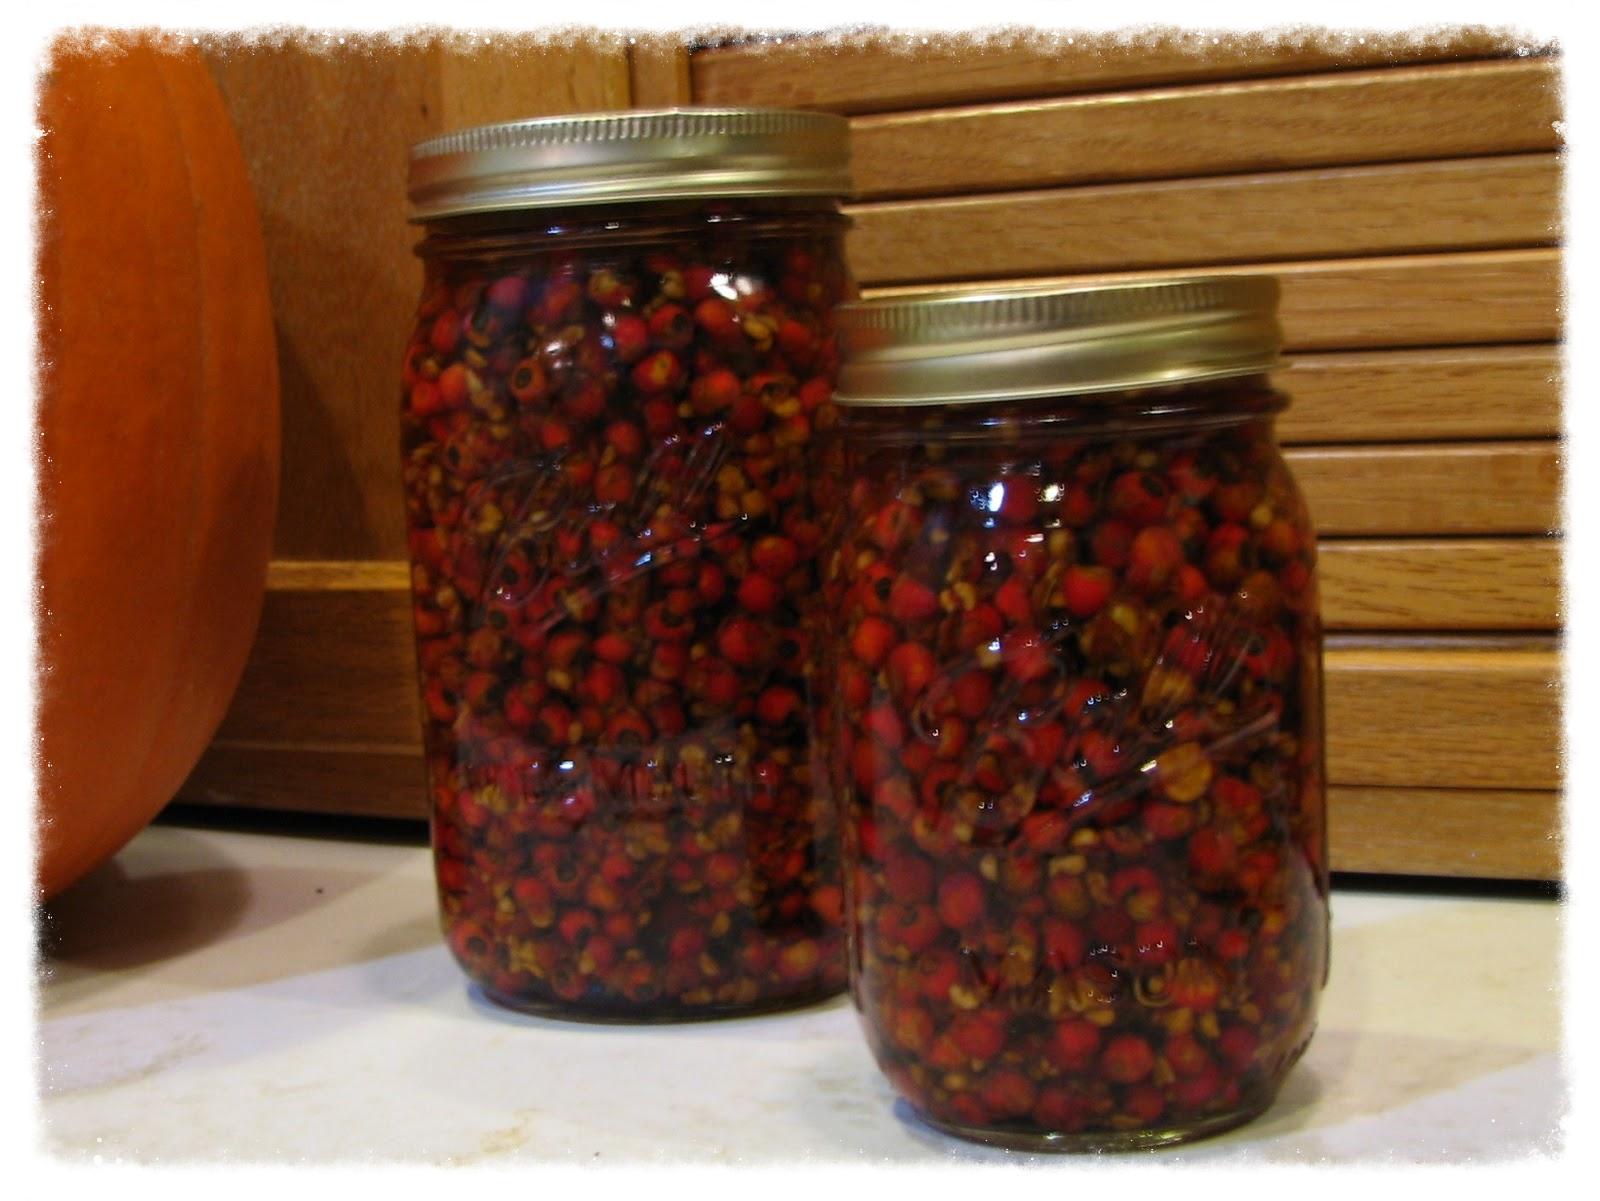 Macerating hawthorn berries; evolving medicinal tincture.